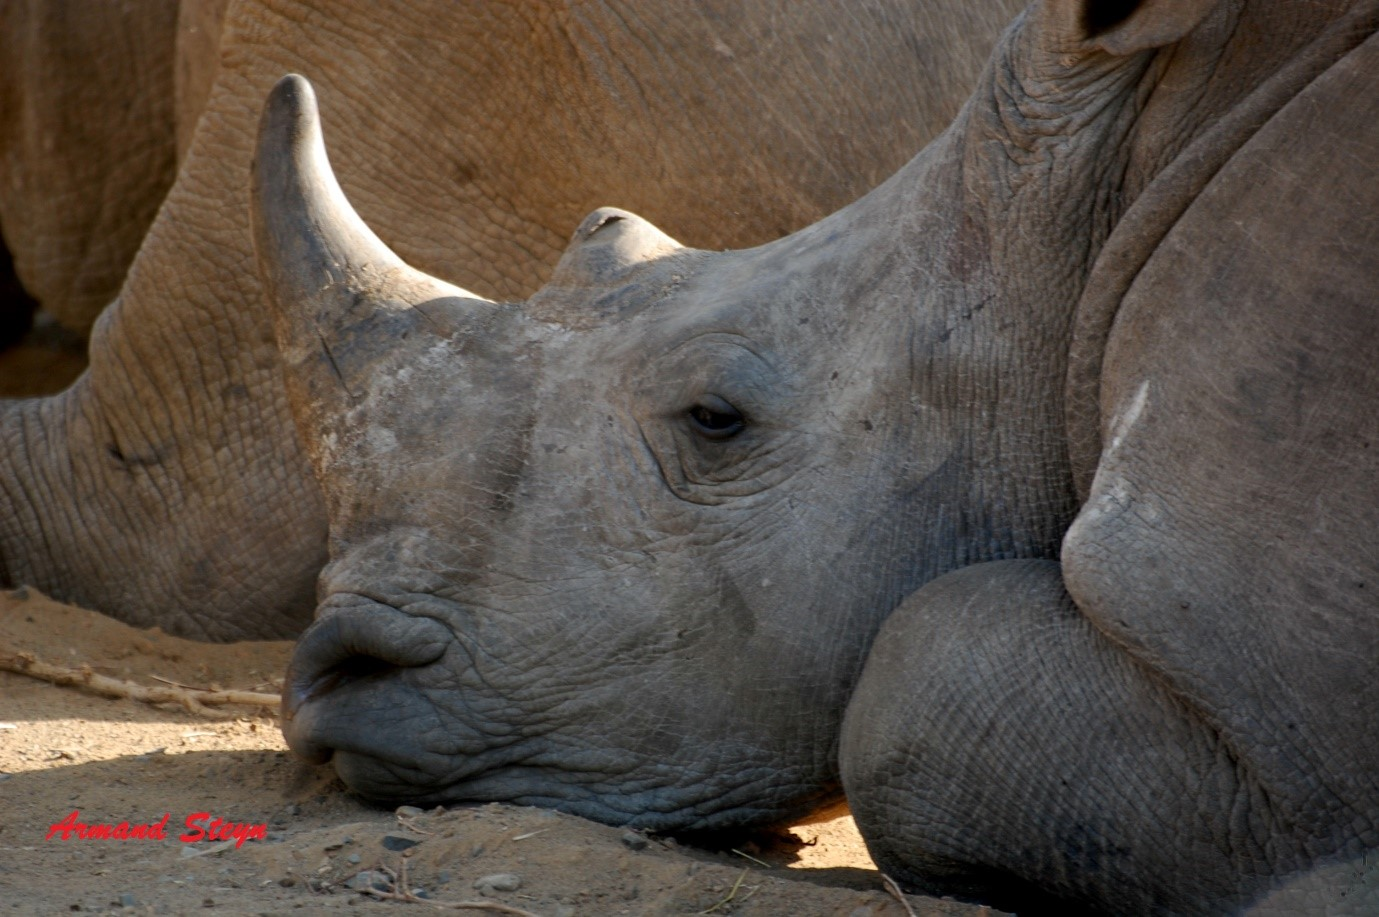 Rhino resting - photograph by ranger Armand Steyn